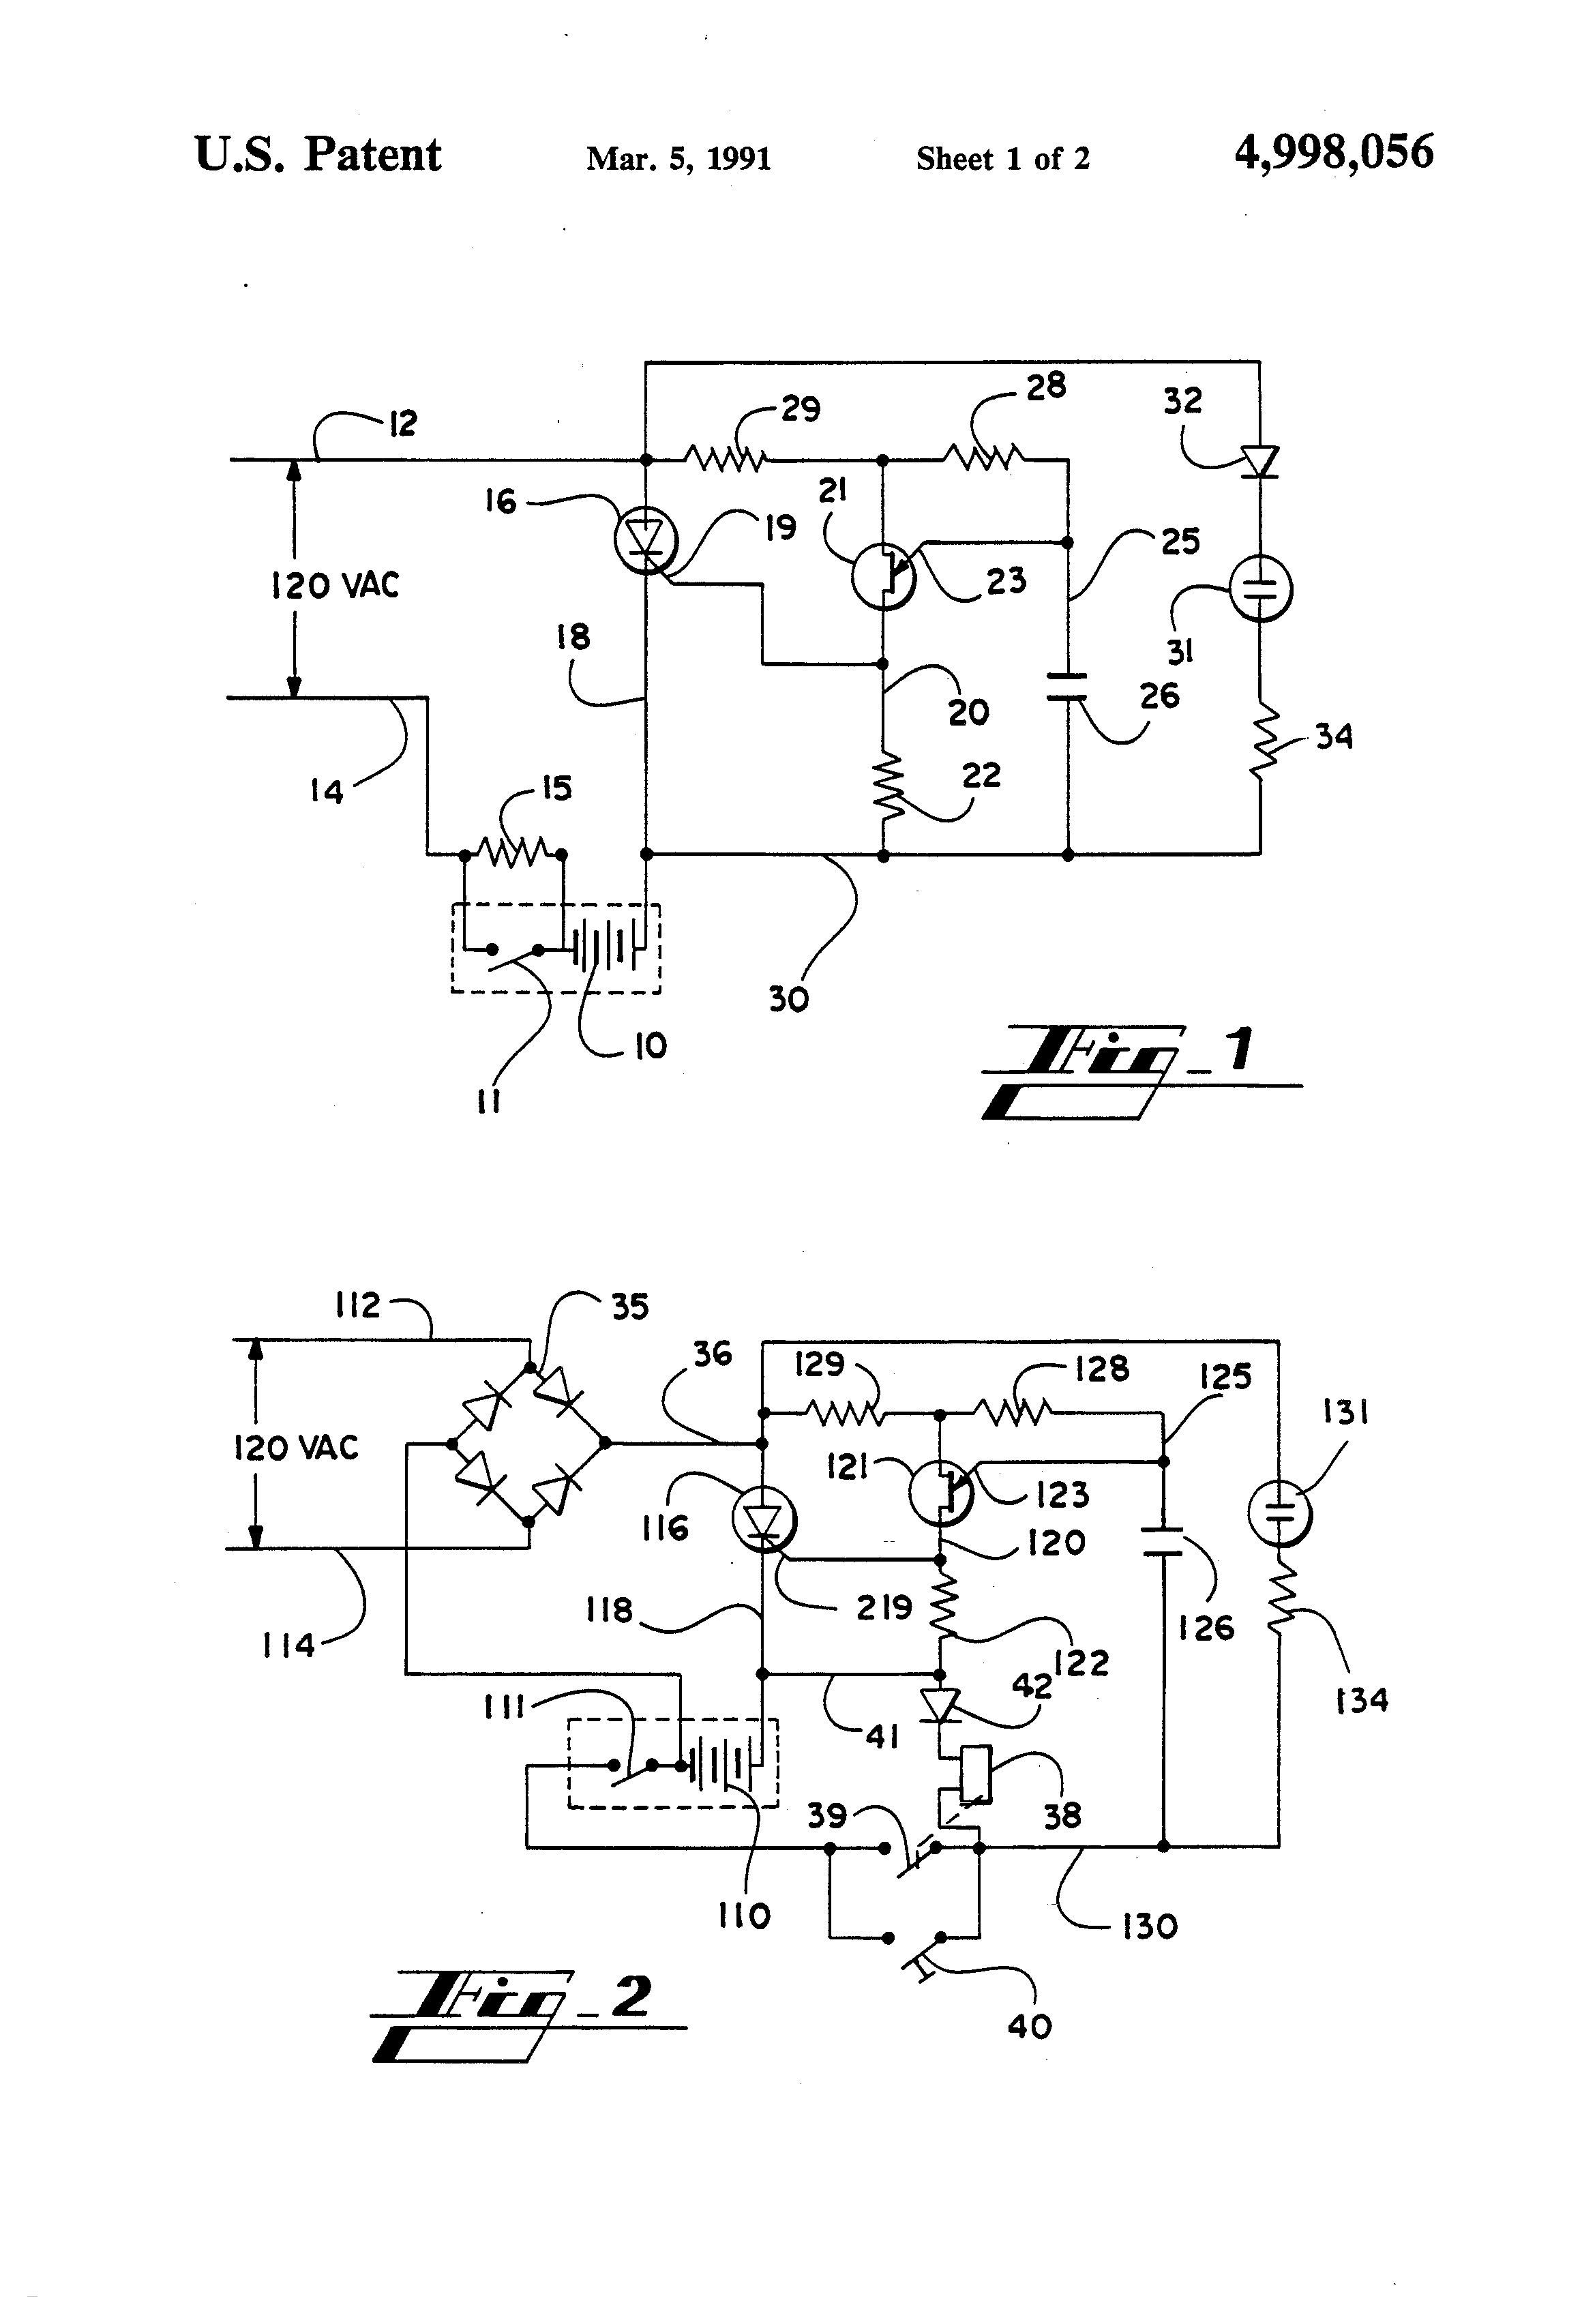 Car Battery Charger Circuit Diagram Circuit Diagram Battery New Patent Us Battery Charger Google Patents Of Car Battery Charger Circuit Diagram